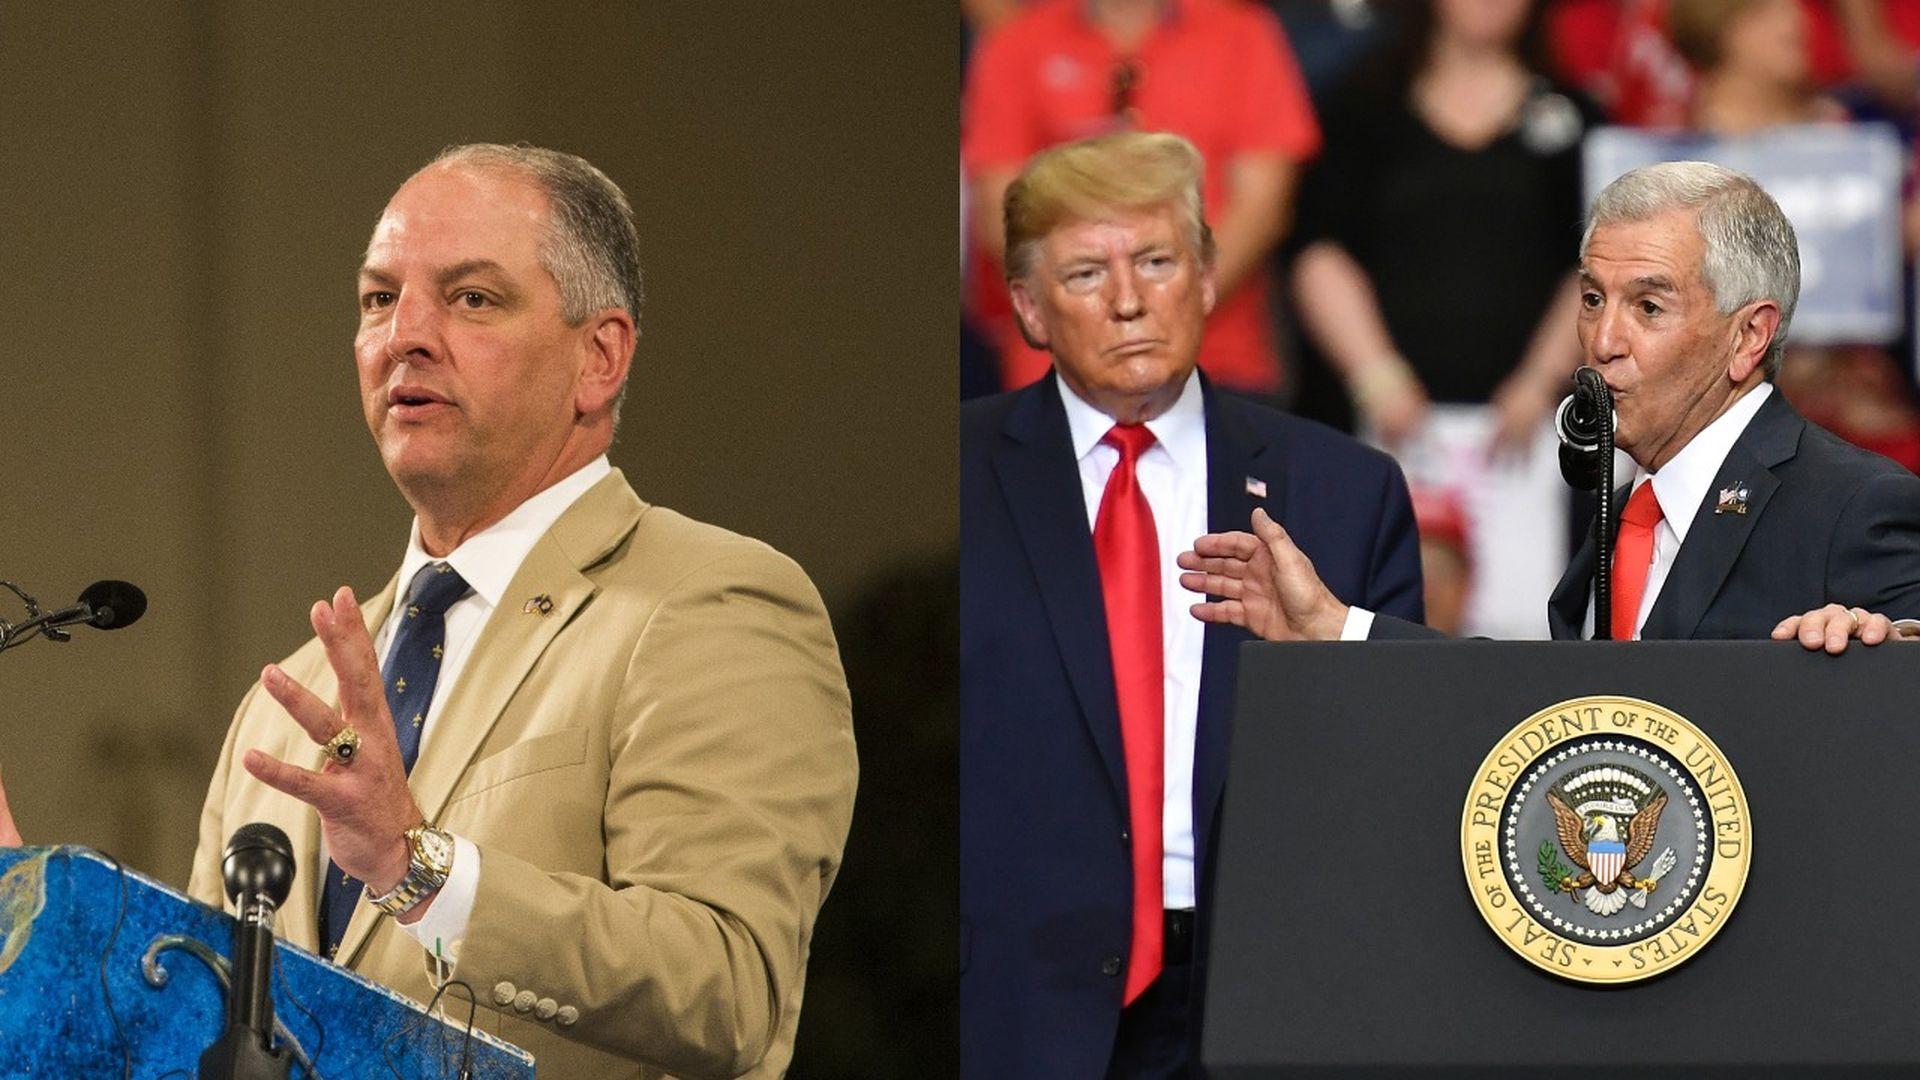 Trump leaps into Louisiana governor's race